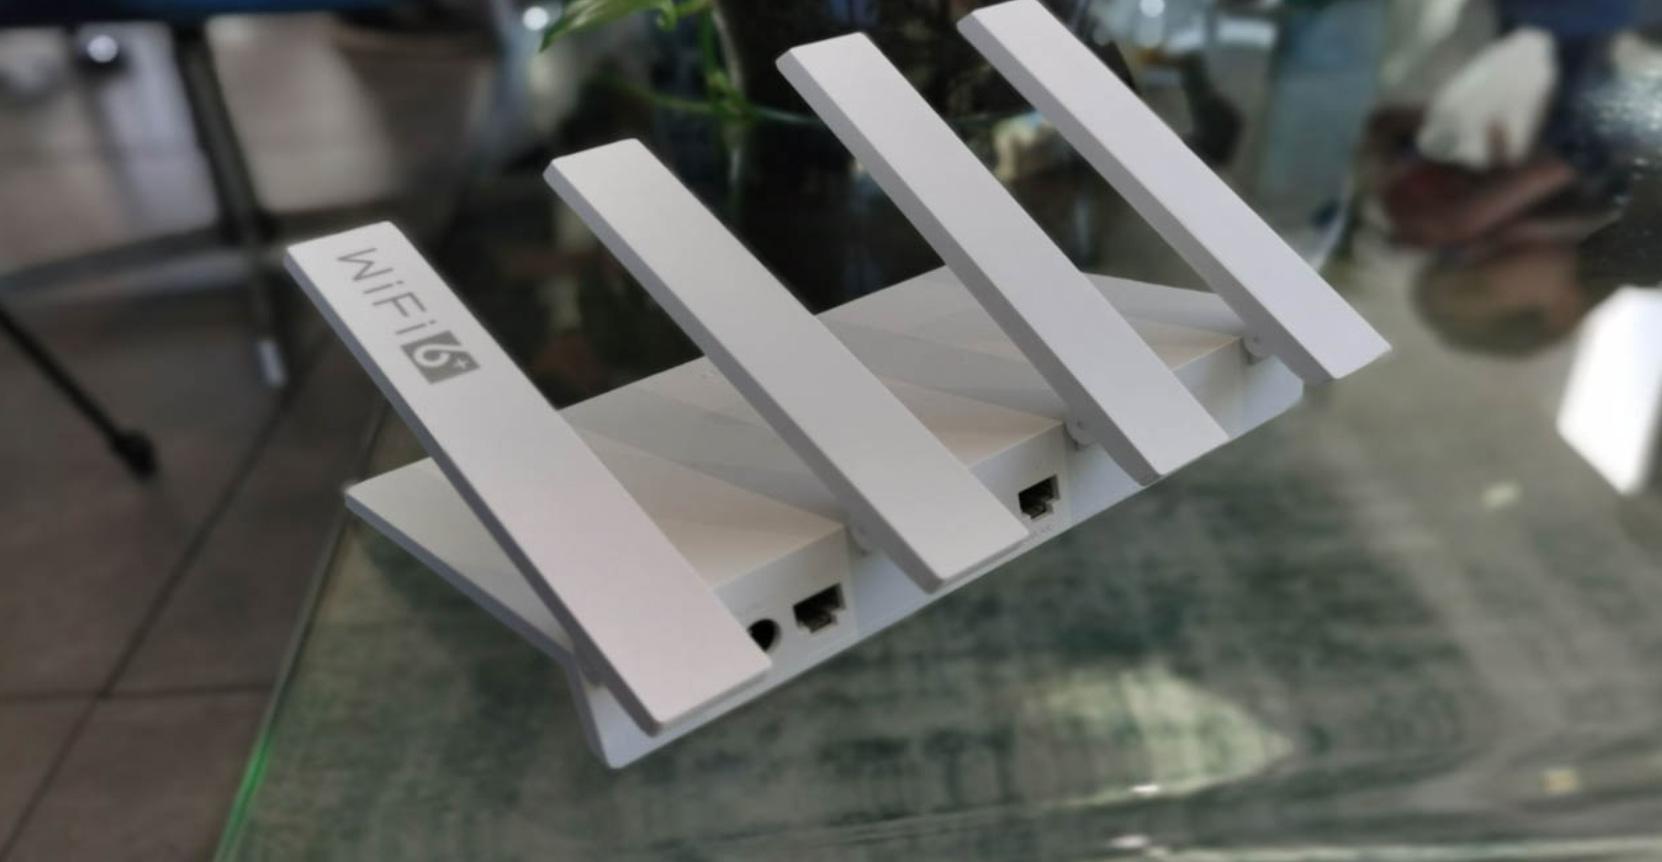 Беспроводной маршрутизатор Huawei AX3 Quad-Core WiFi 6+ MESH Gigabit Router HUAWEI - фото 8